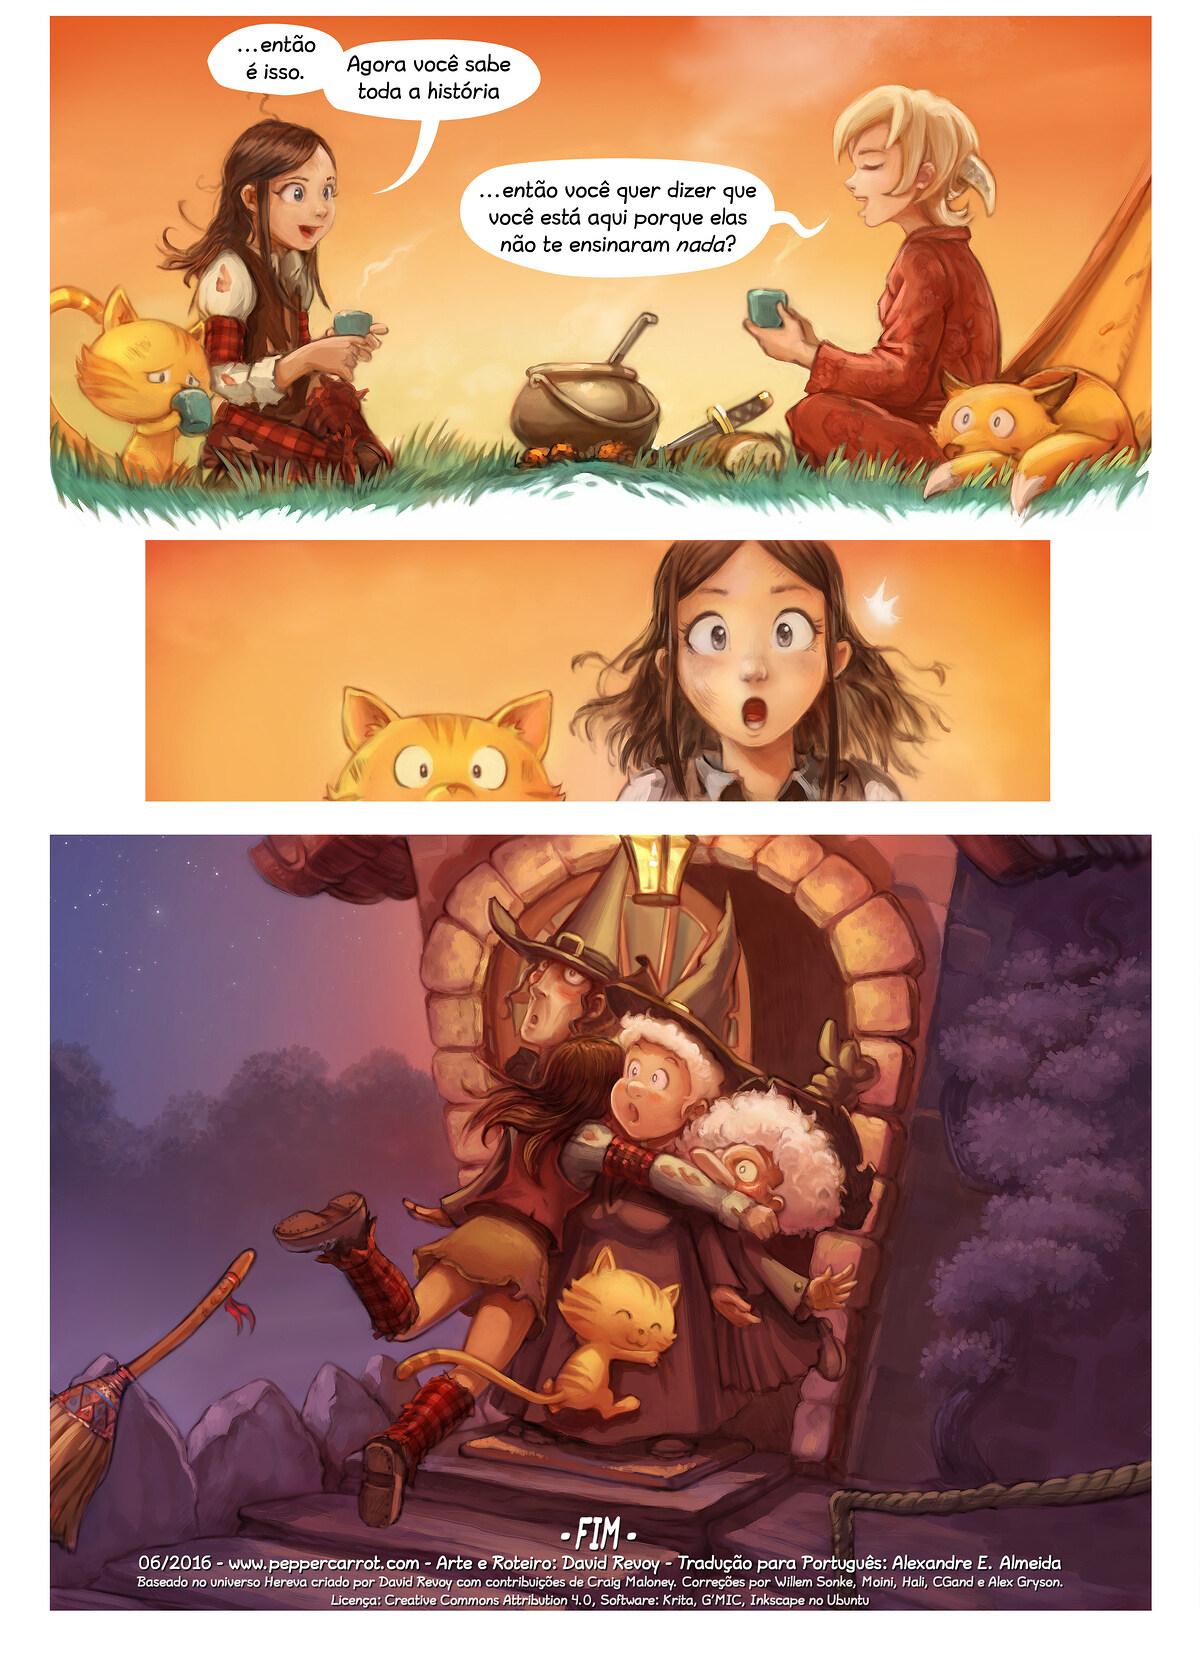 A webcomic page of Pepper&Carrot, episódio 17 [pt], página 7